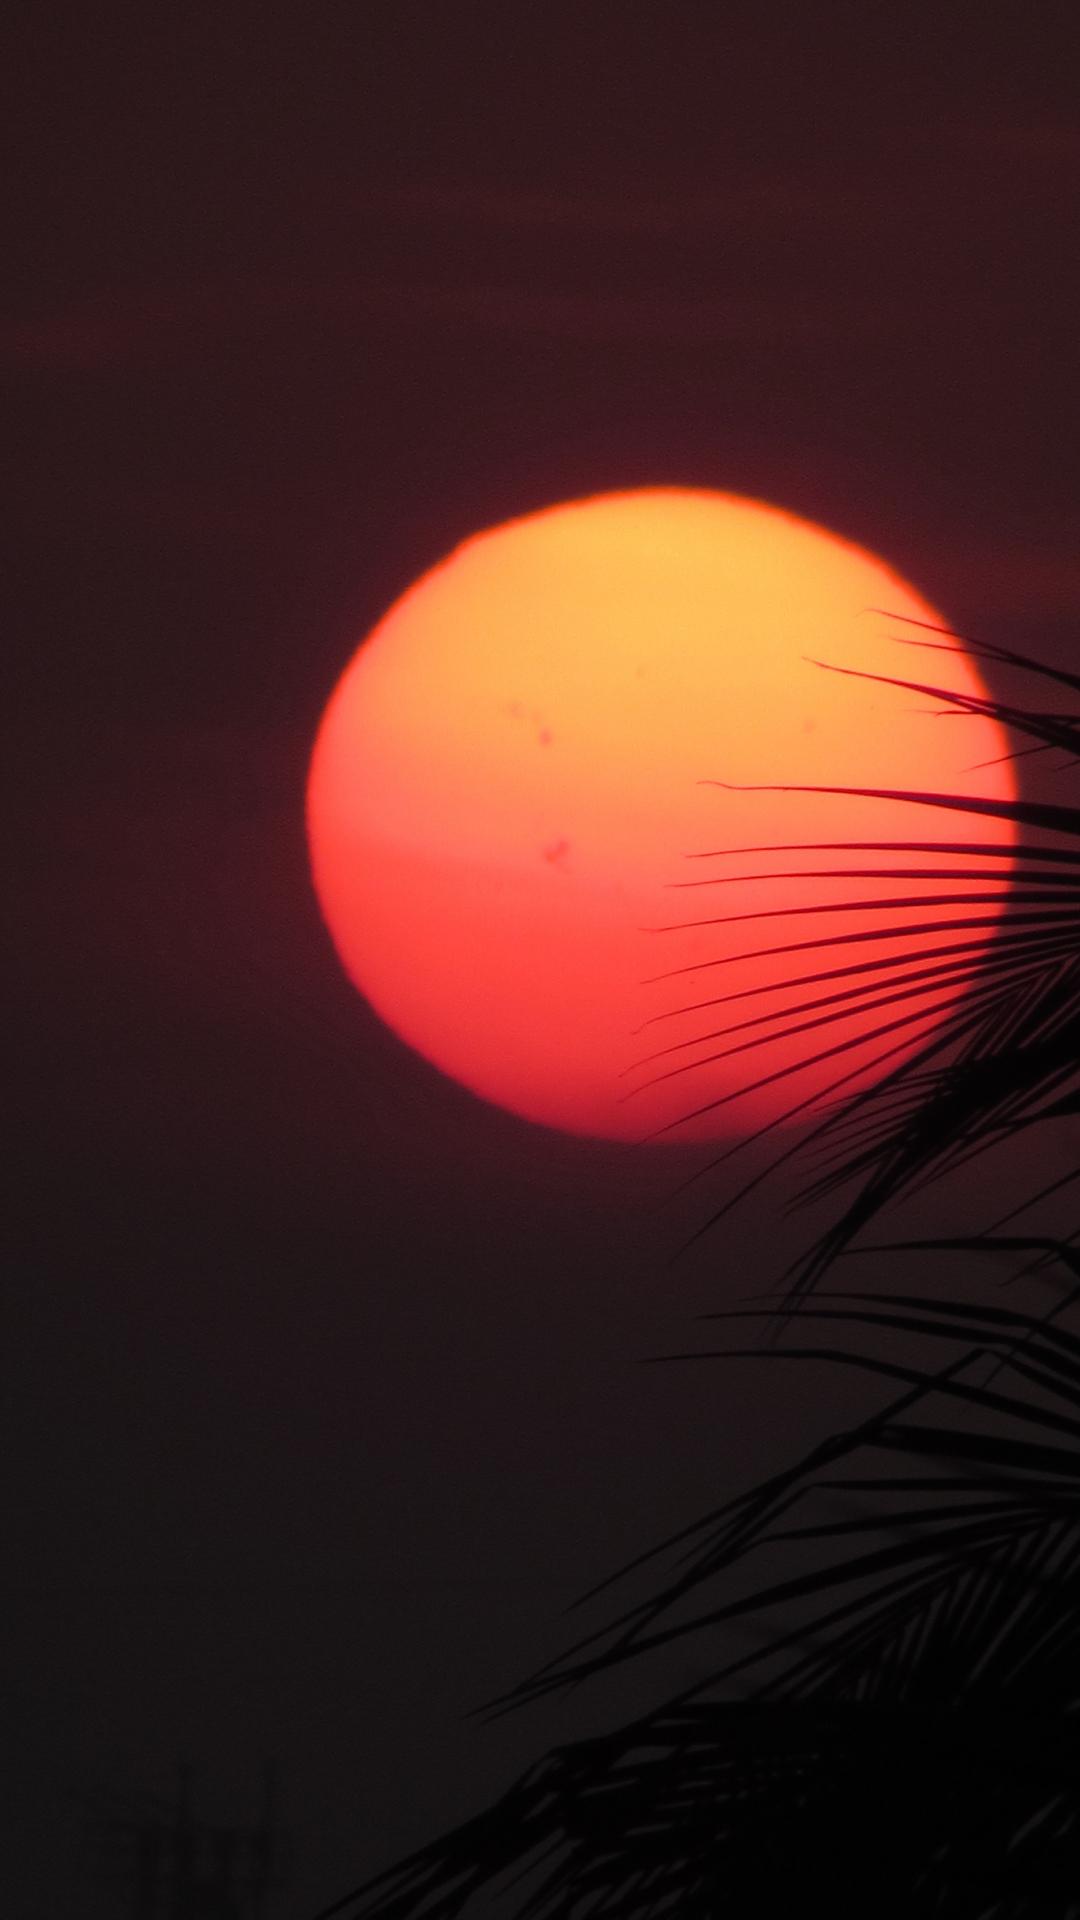 Red Orange Sun Leaves iPhone Wallpaper